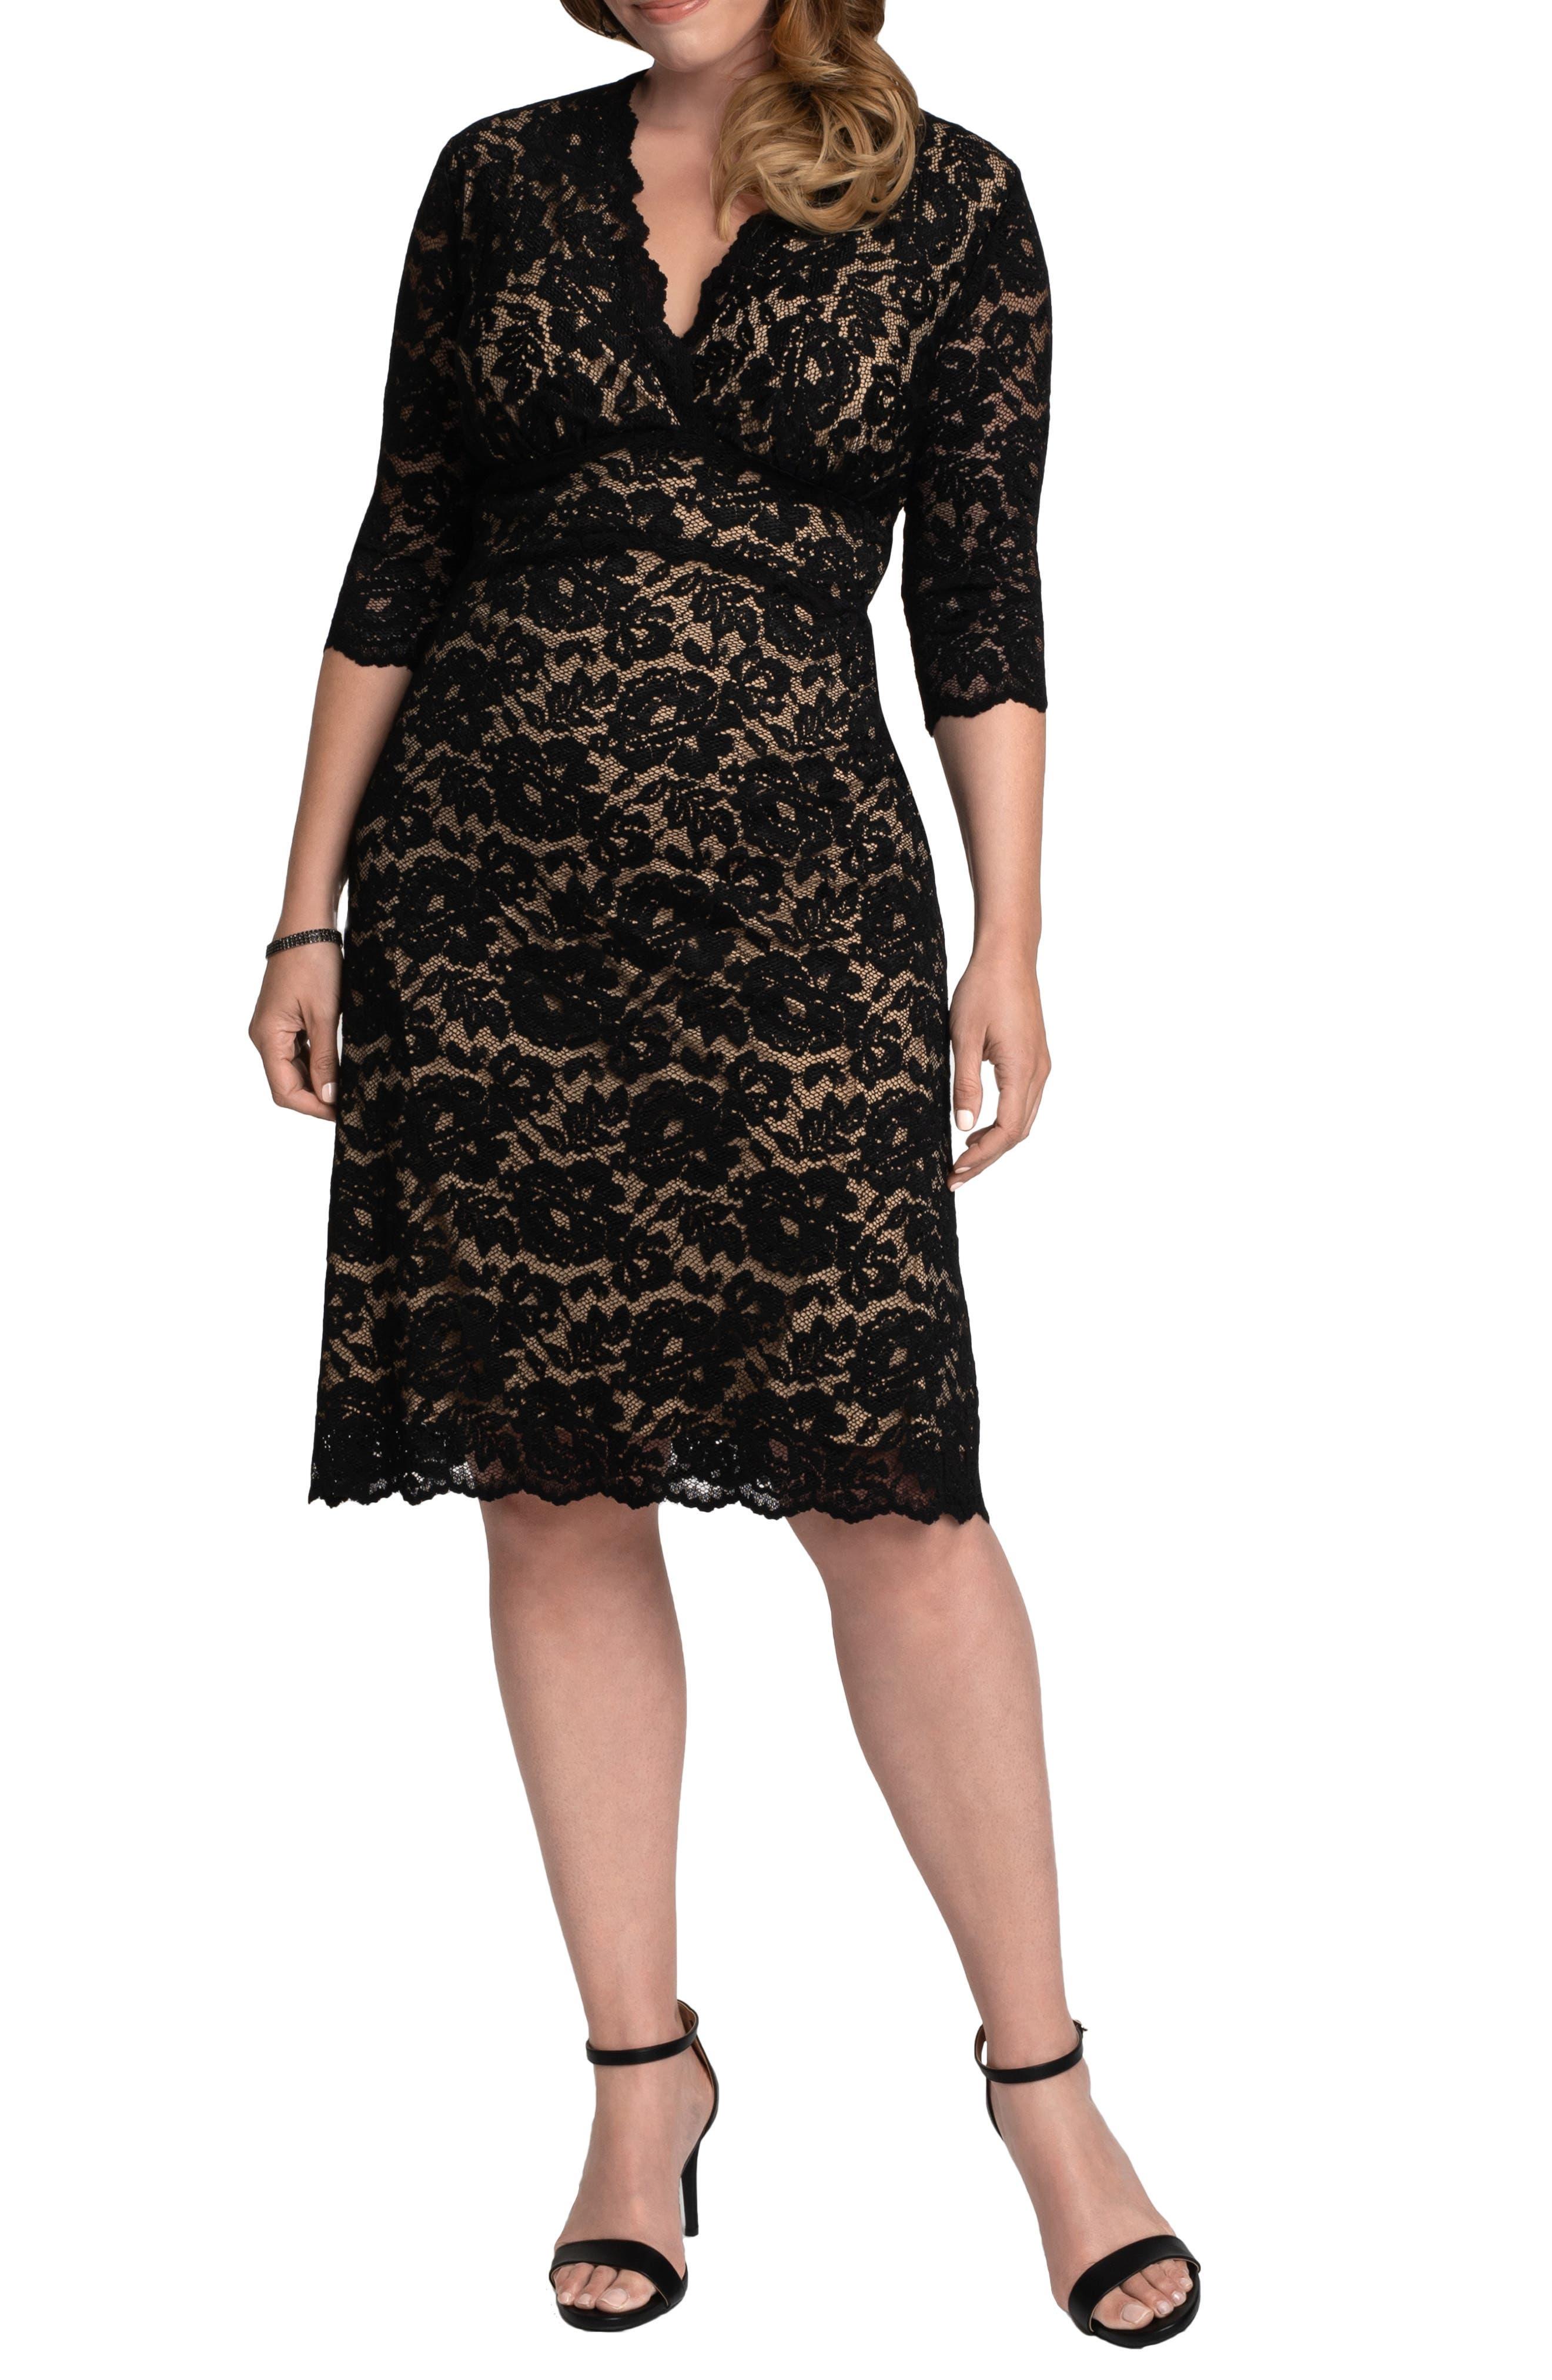 Scalloped Boudoir Lace Sheath Dress